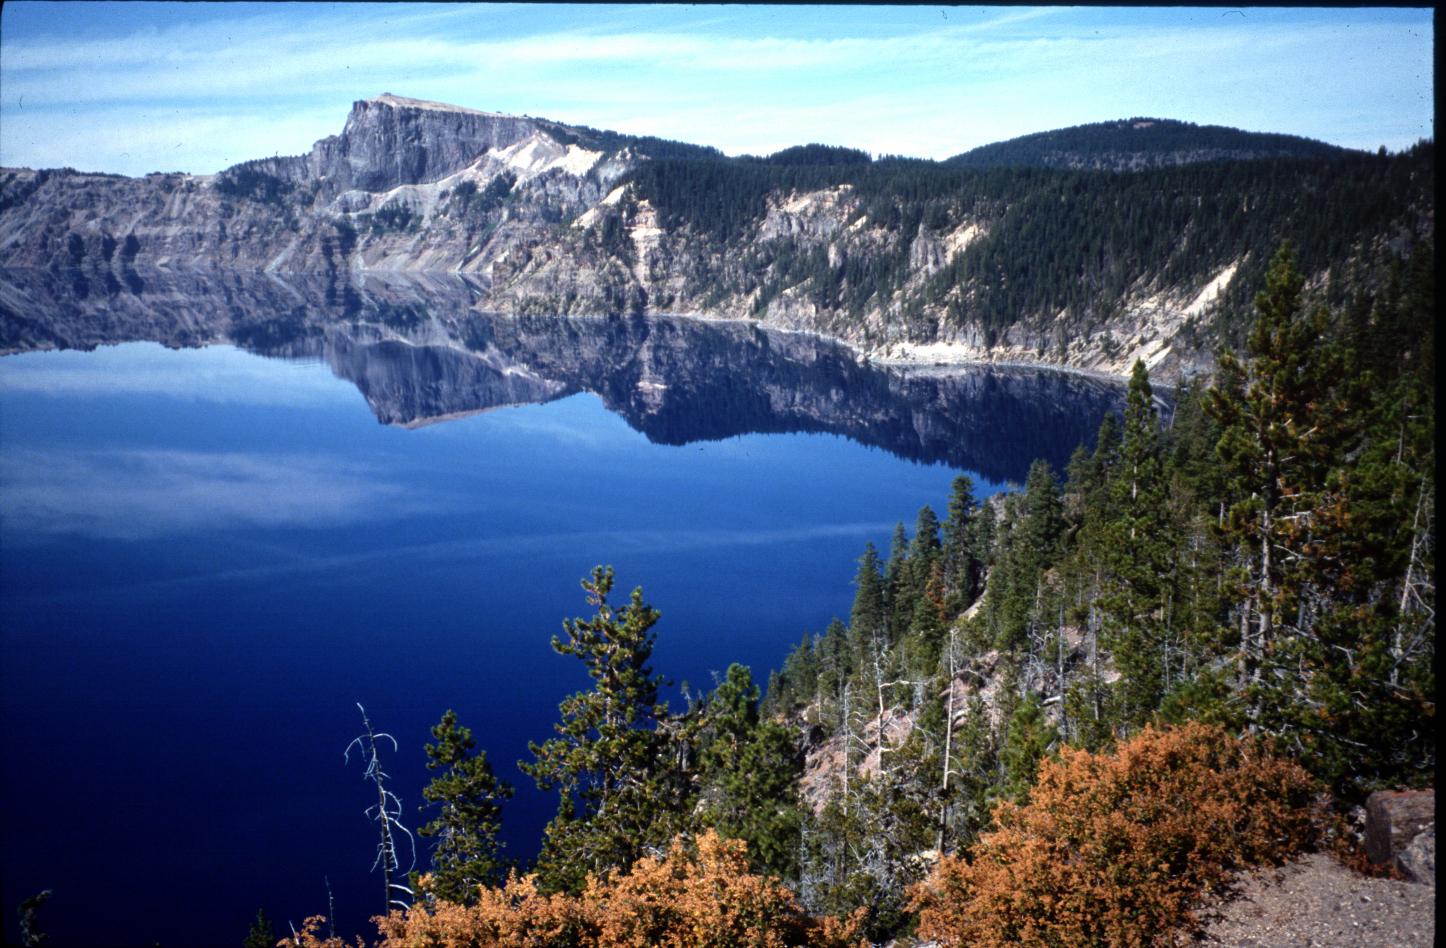 http://4.bp.blogspot.com/-9h_l4I9VN3Q/TbT4FXF1SgI/AAAAAAAAAGY/d9fq7G81dbw/s1600/crater.lake2.jpg